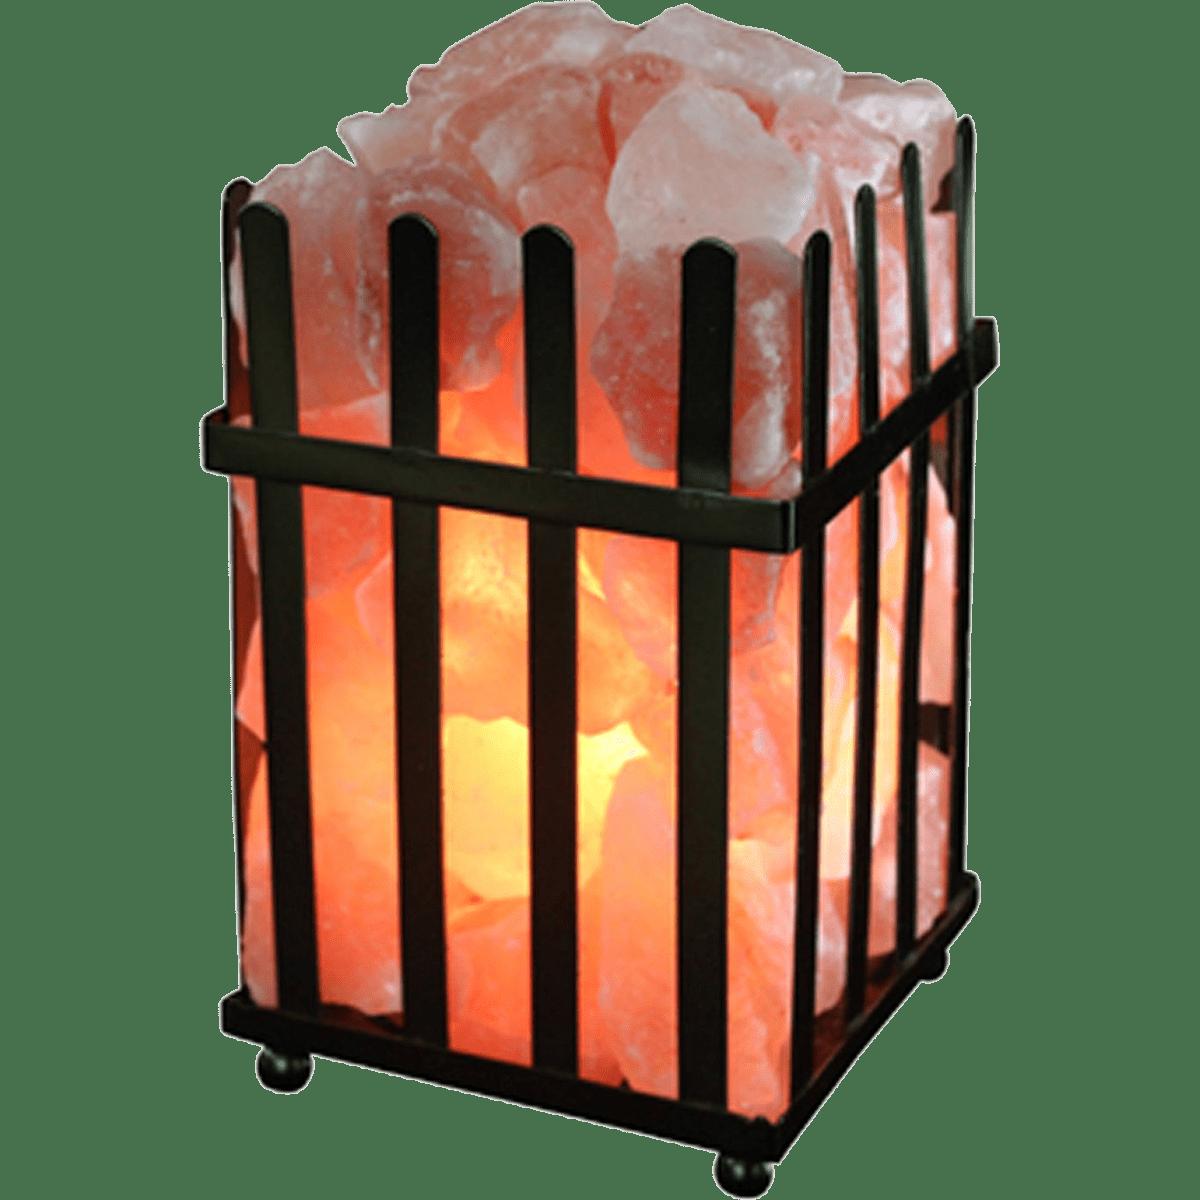 Wbm international picket frame lamp w salt crystal chunks for Wbm 7 tall himalayan natural crystal salt lamp